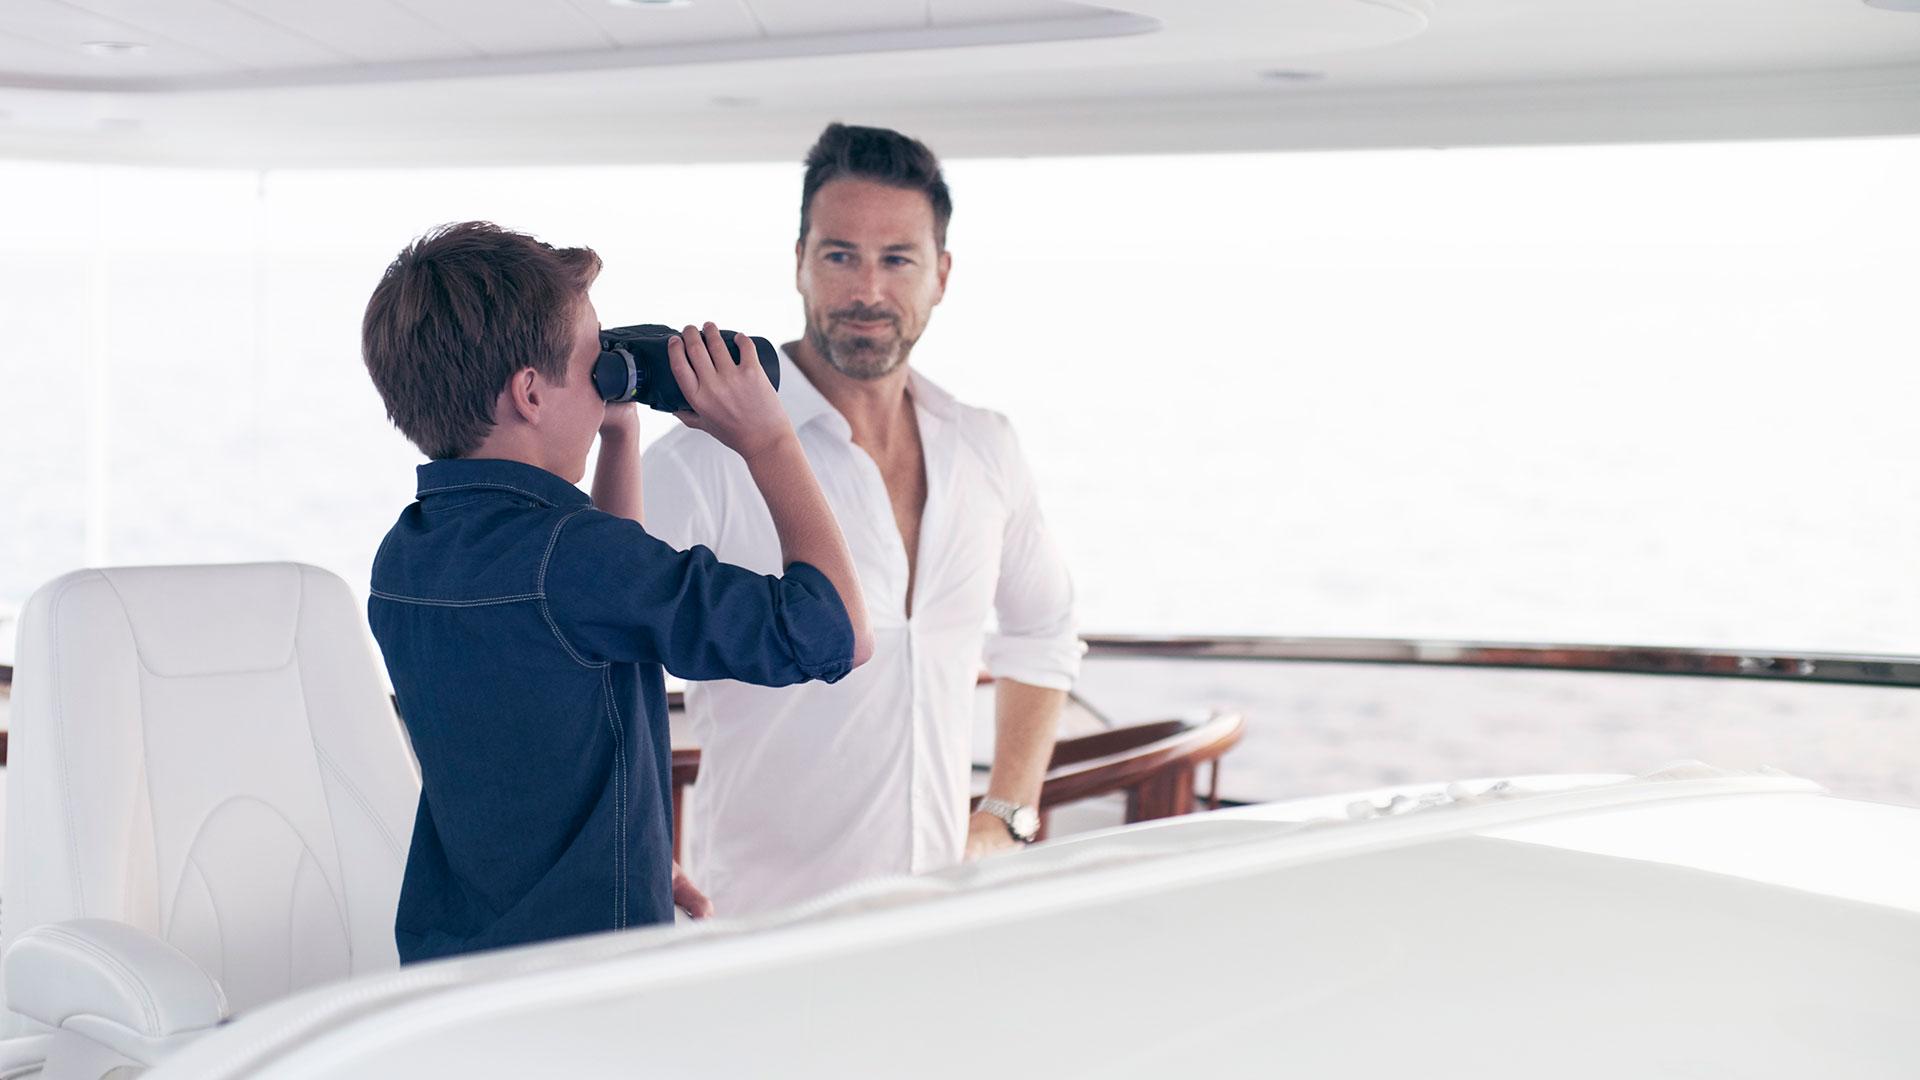 AvYachts - Shared Yacht Ownership